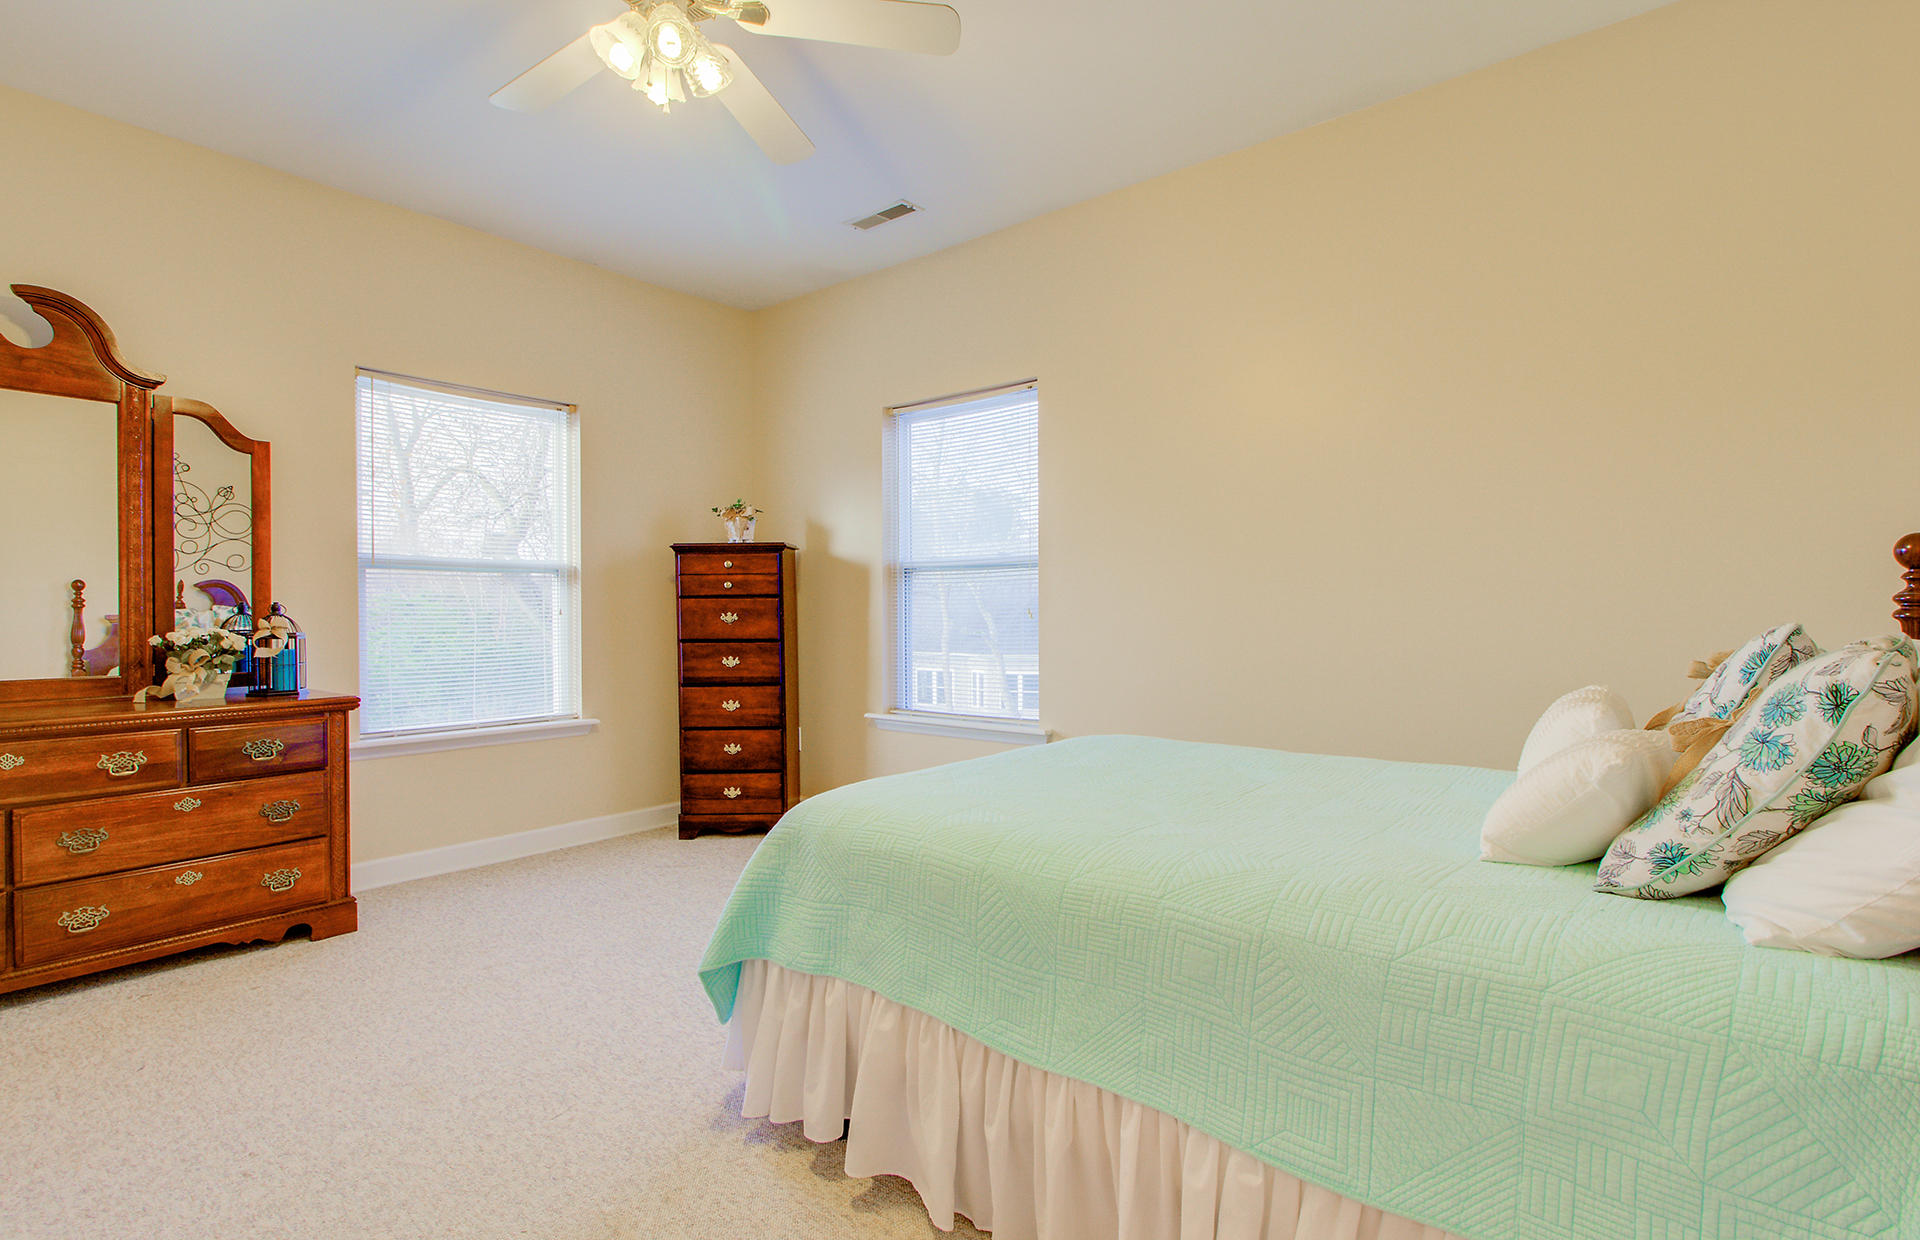 Bakers Landing Homes For Sale - 105 River Oak, North Charleston, SC - 2